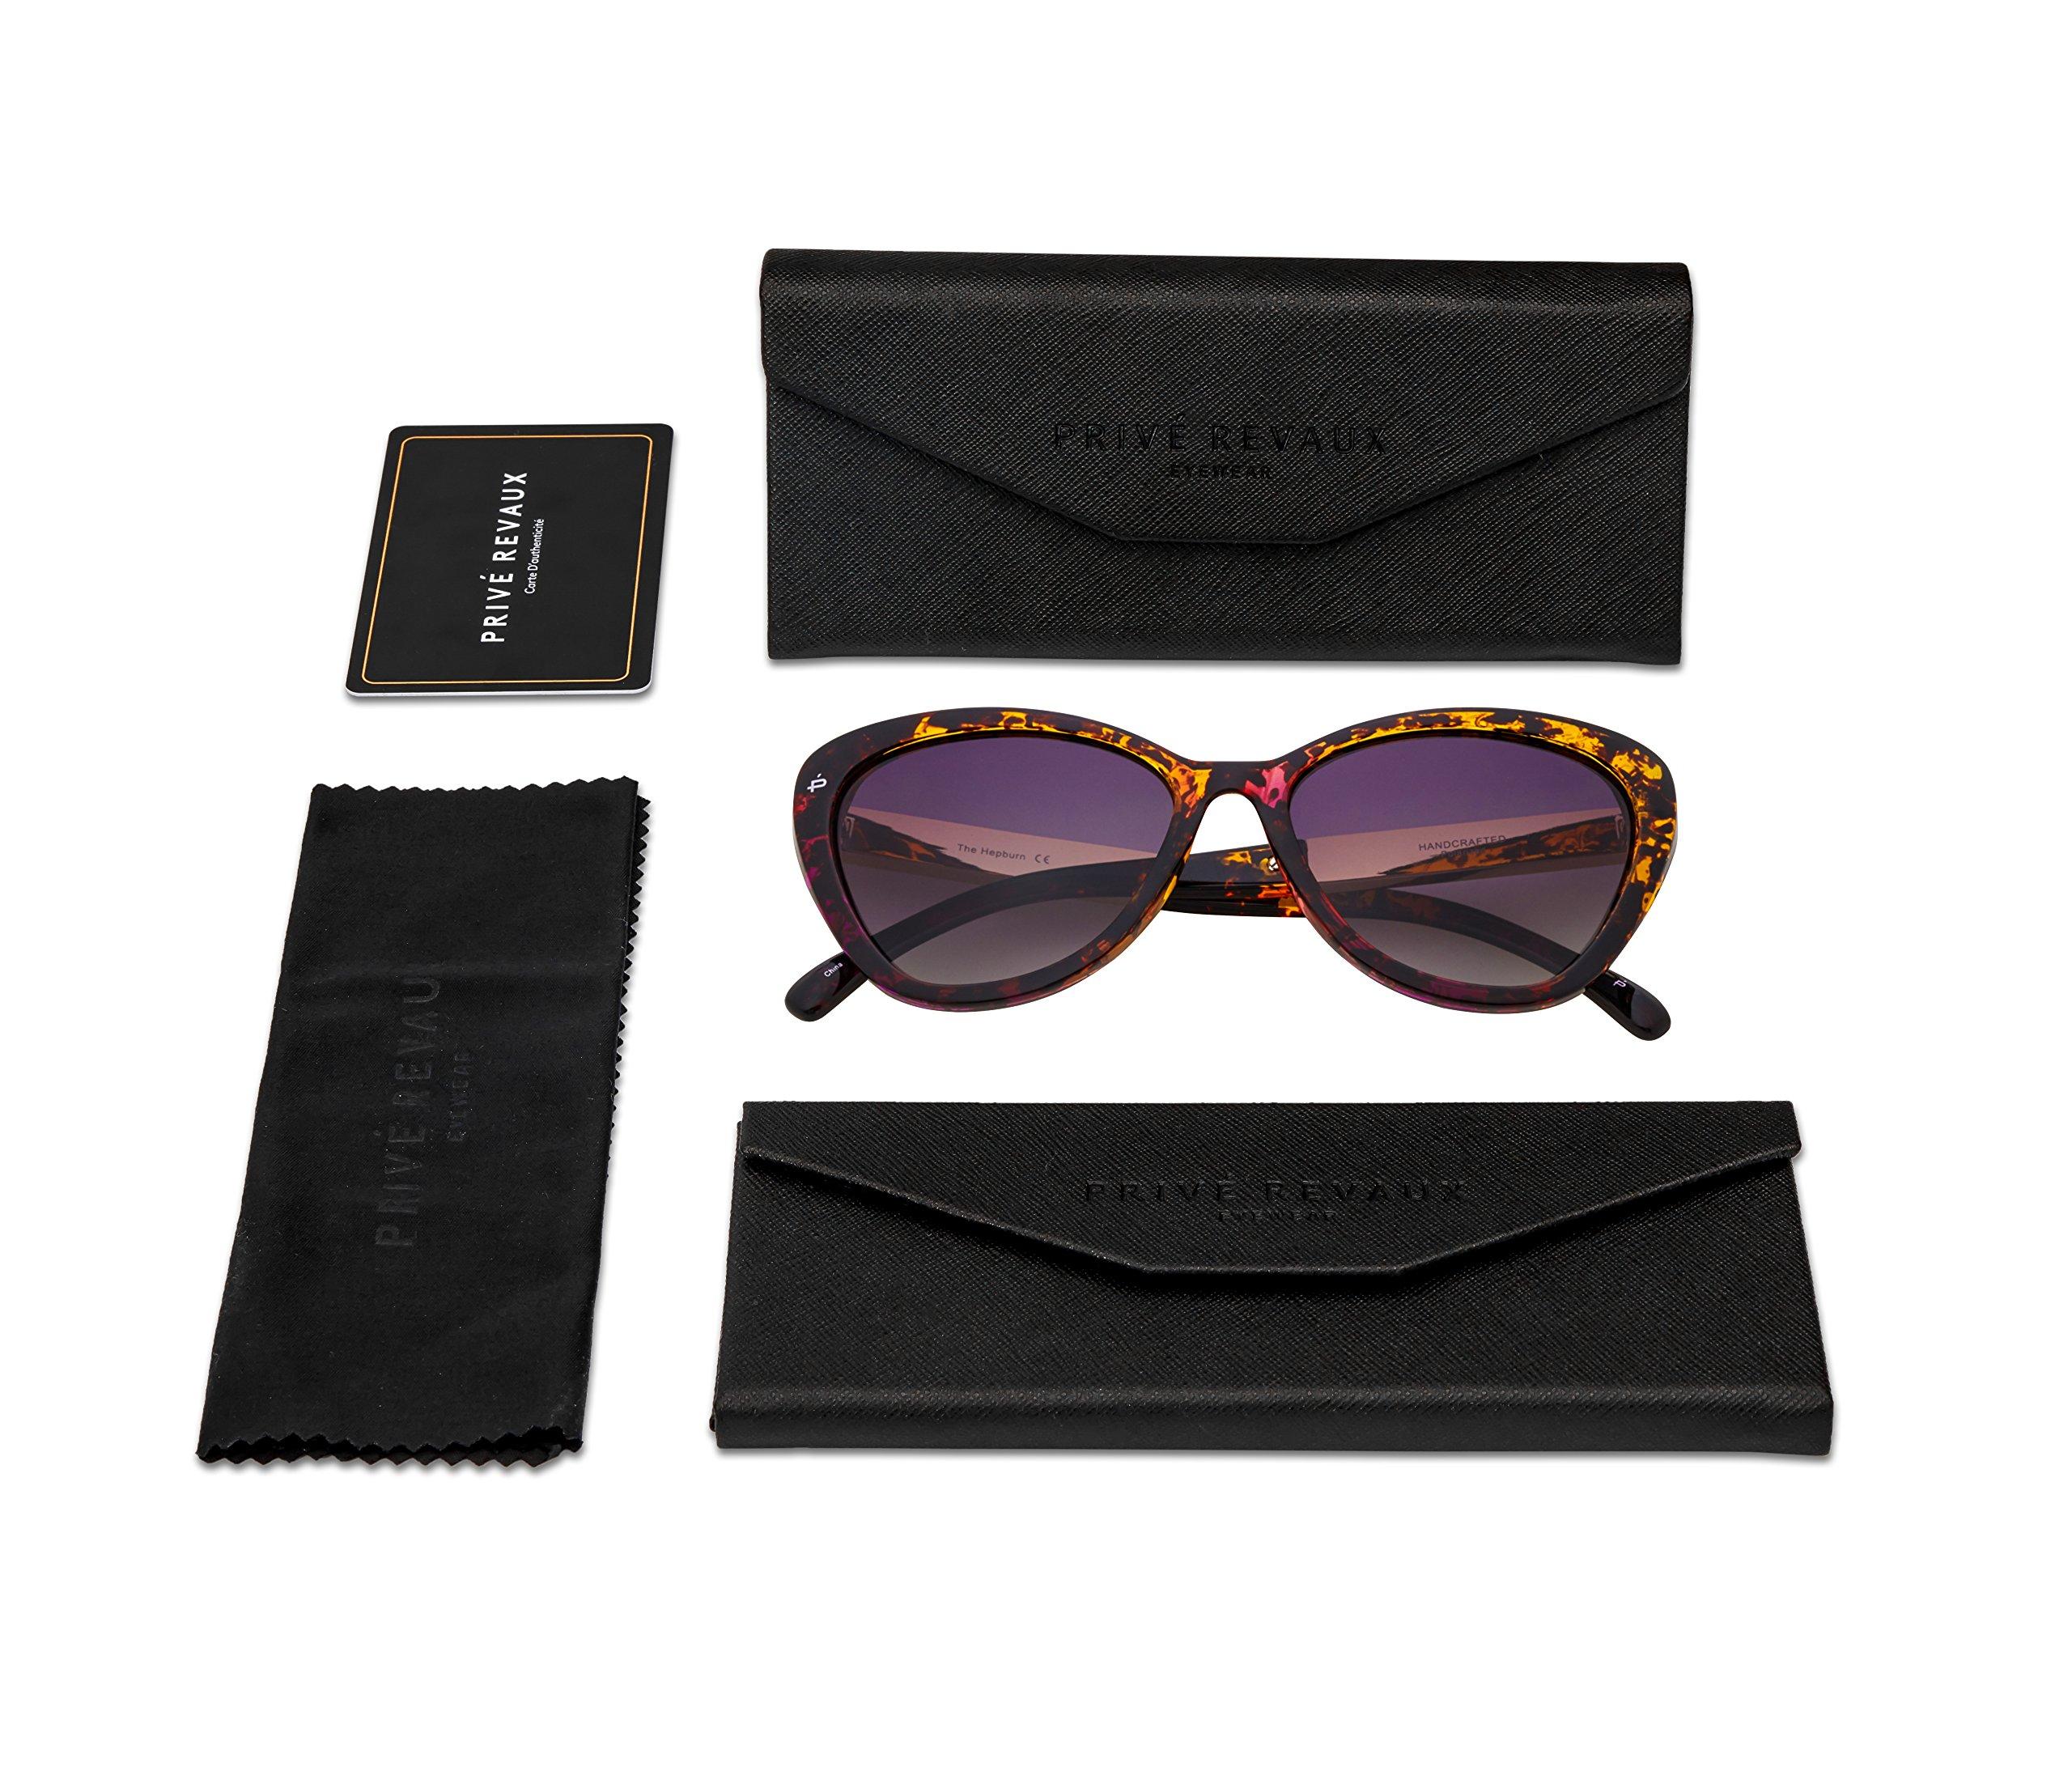 "PRIVÉ REVAUX ICON Collection ""The Hepburn"" Designer Polarized Retro Cat-Eye Sunglasses by PRIVÉ REVAUX (Image #8)"